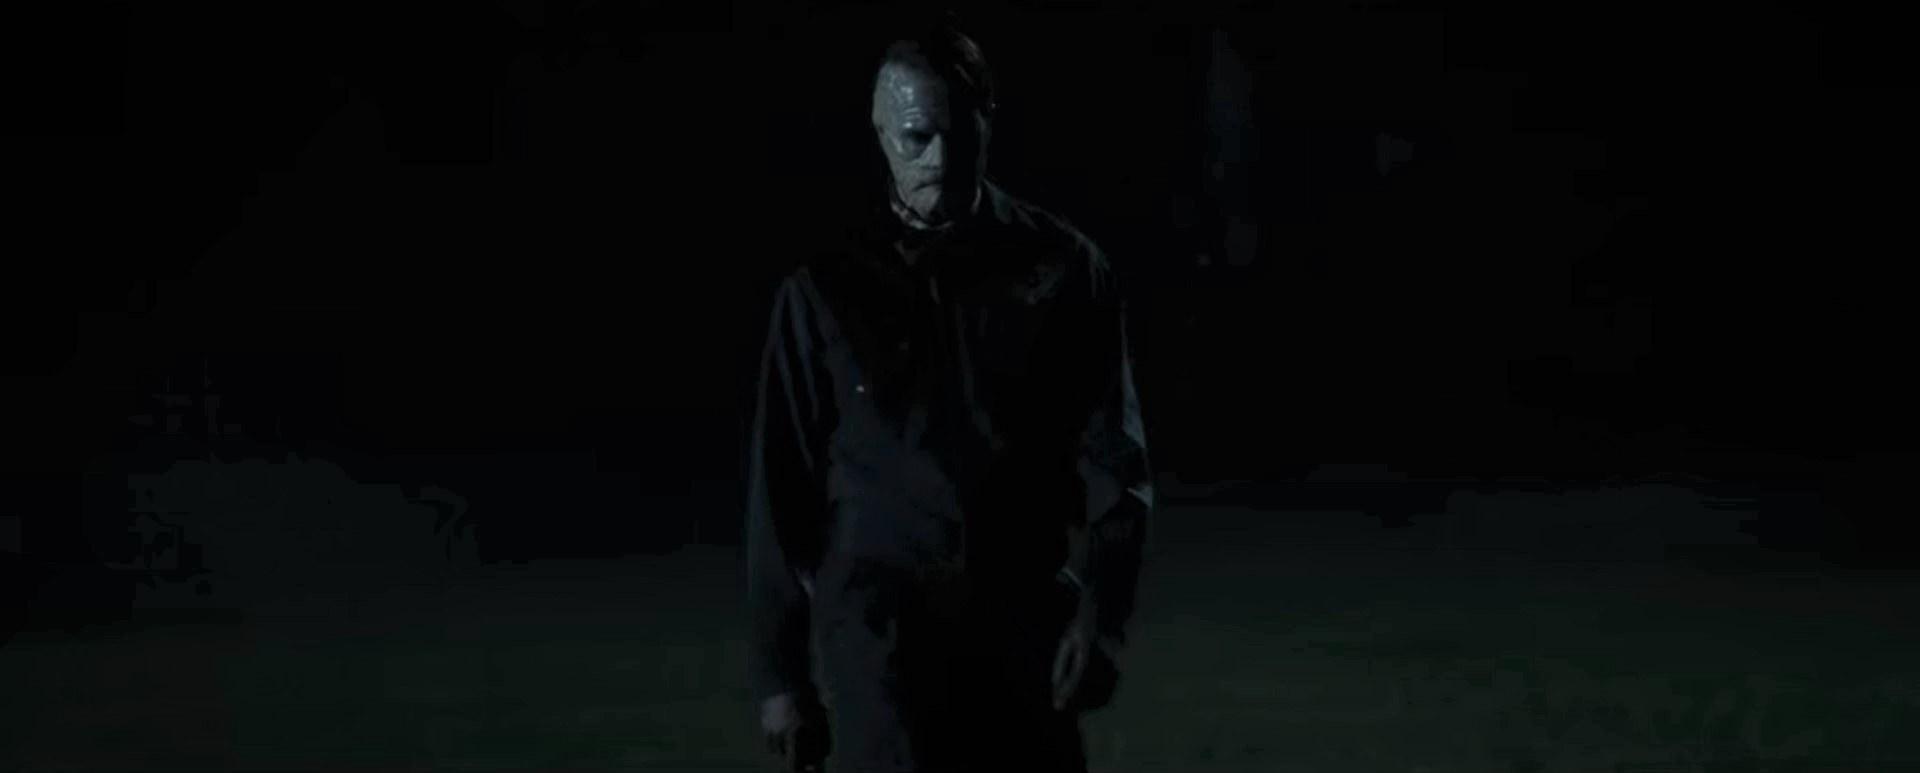 Scary-looking Milkman in the dark